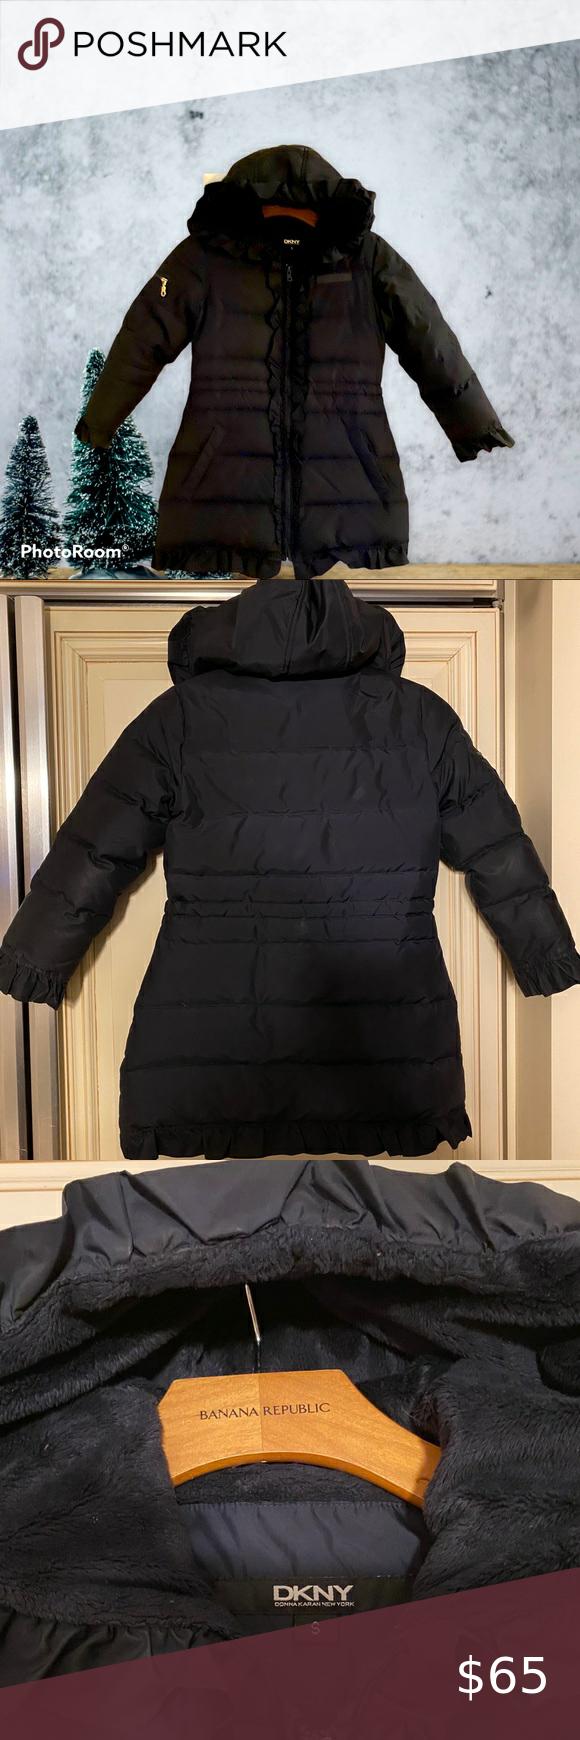 Super Cozy Dkny Girls Ruffle Puffer Coat Size S Girls Puffer Coat Toddler Coats Girl Toddler Winter Jackets [ 1740 x 580 Pixel ]